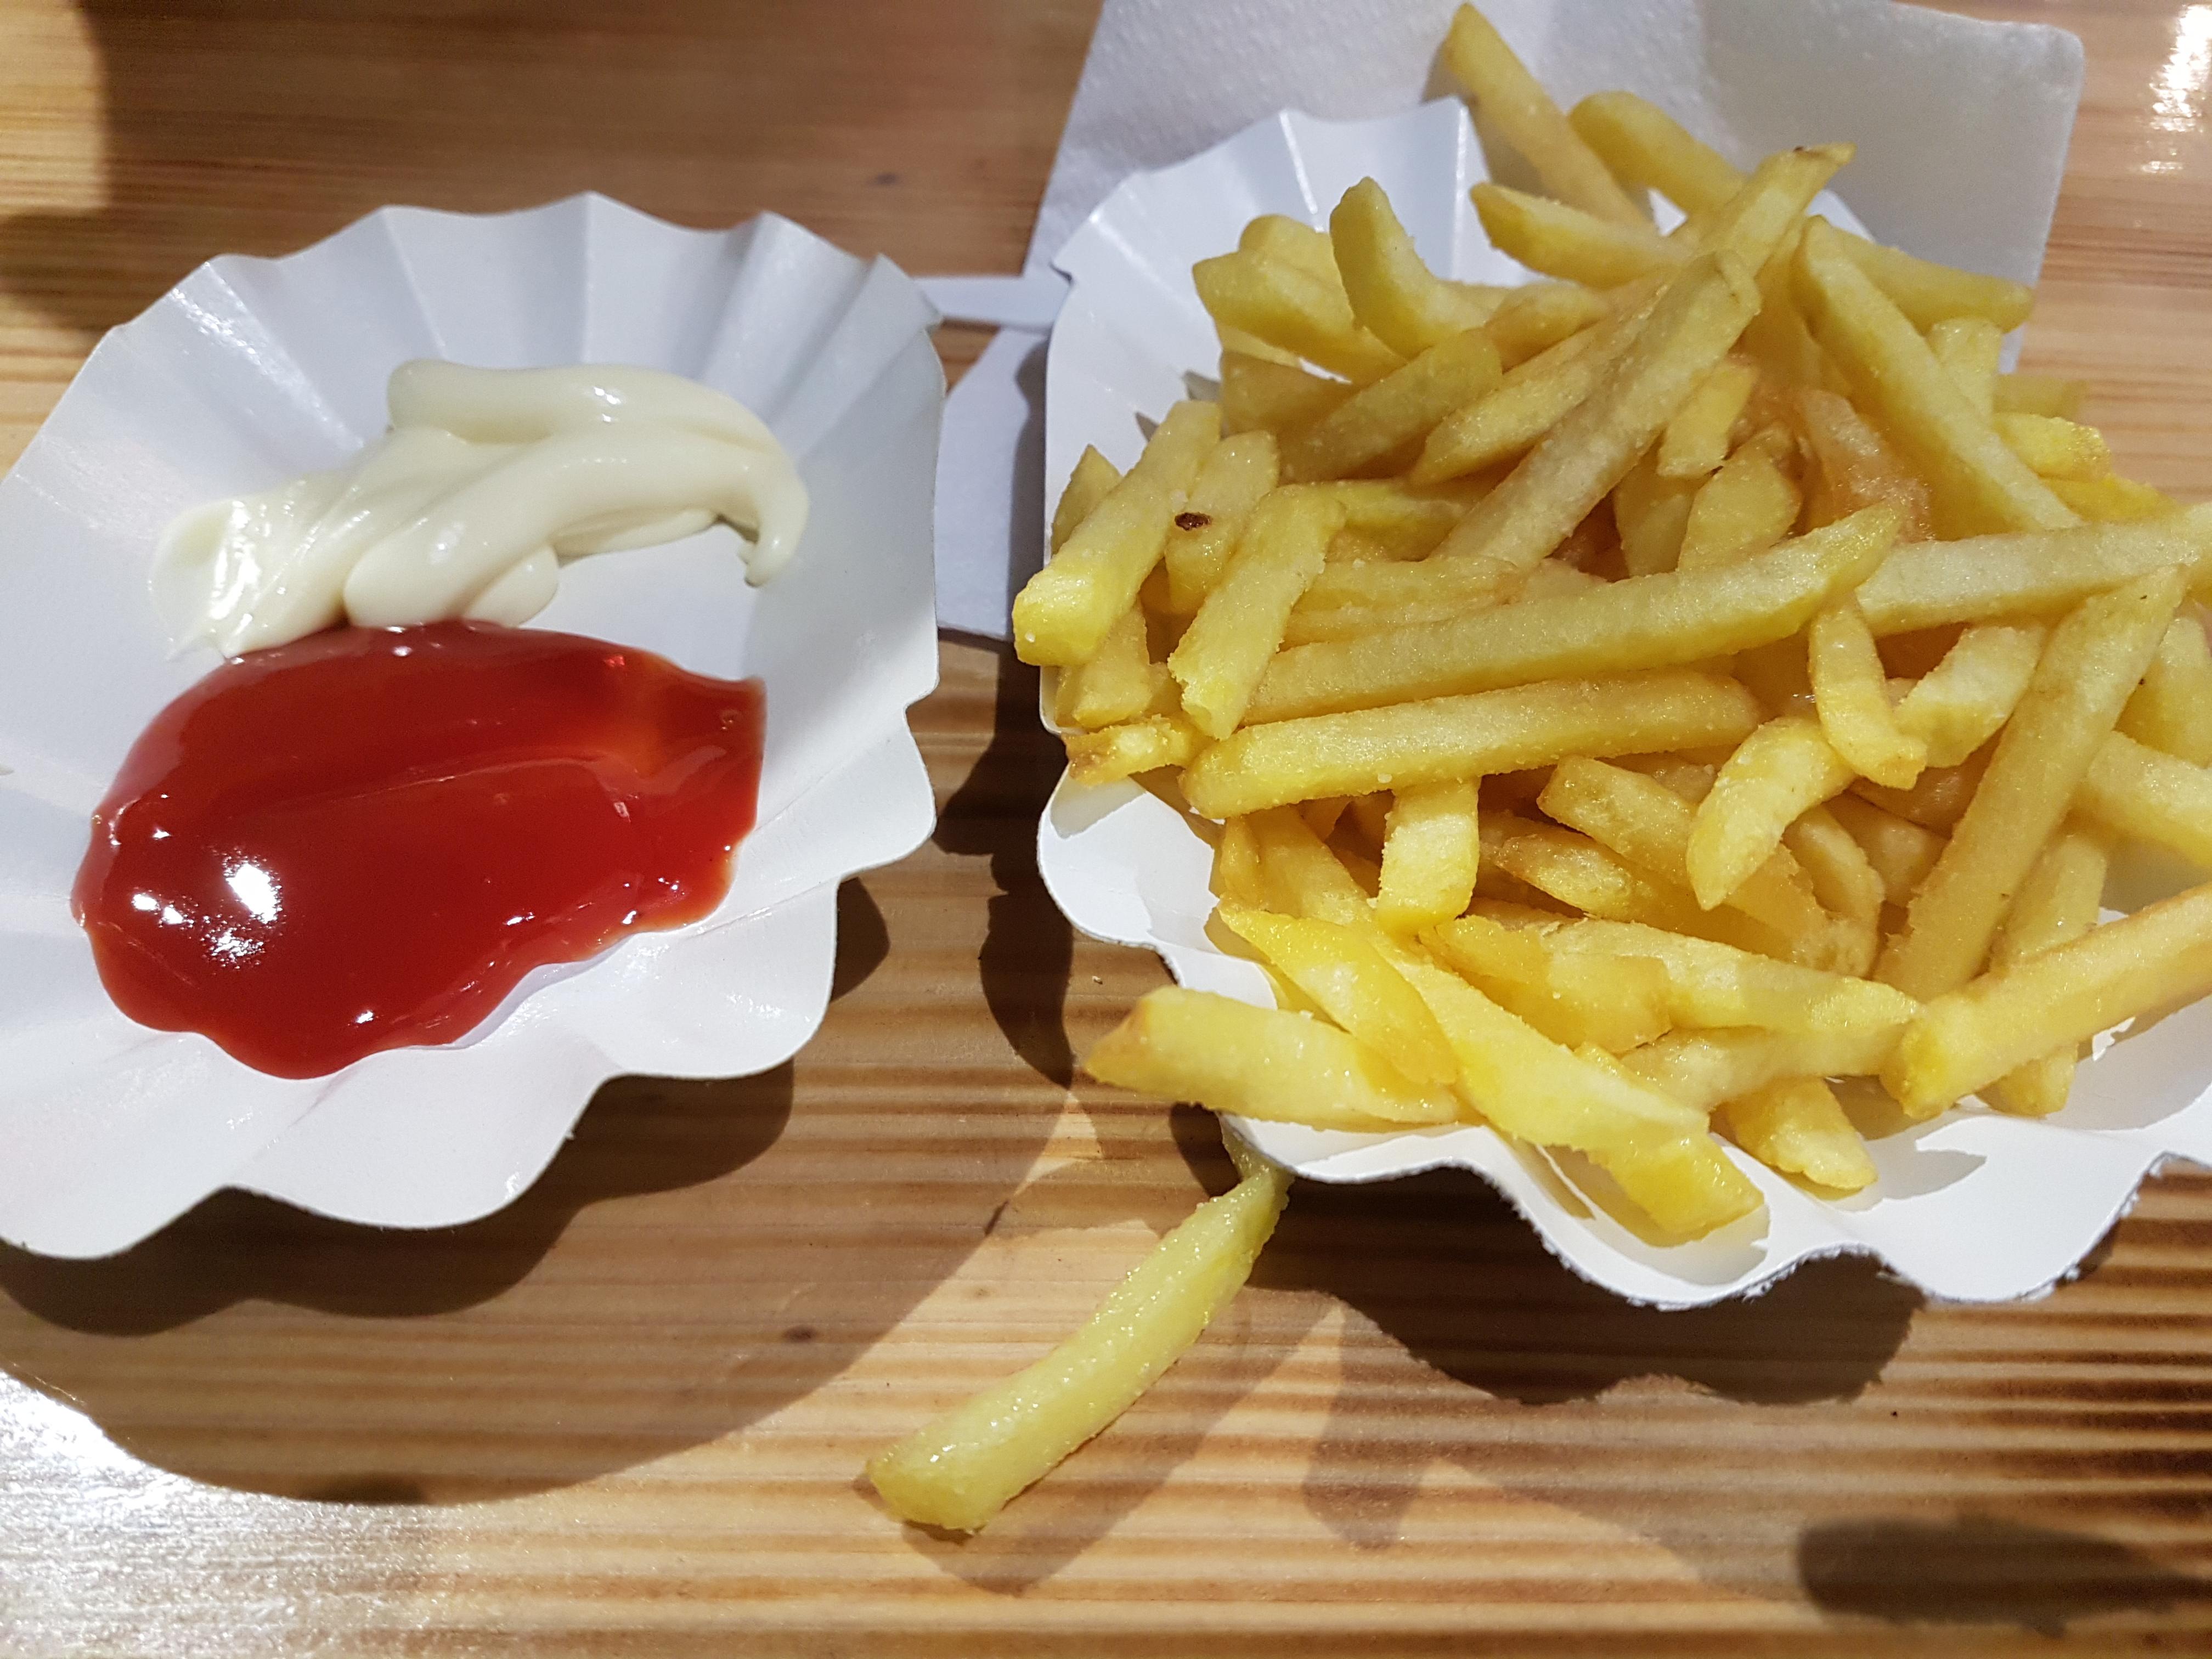 https://foodloader.net/Holz_2018-08-19_Pommes.jpg